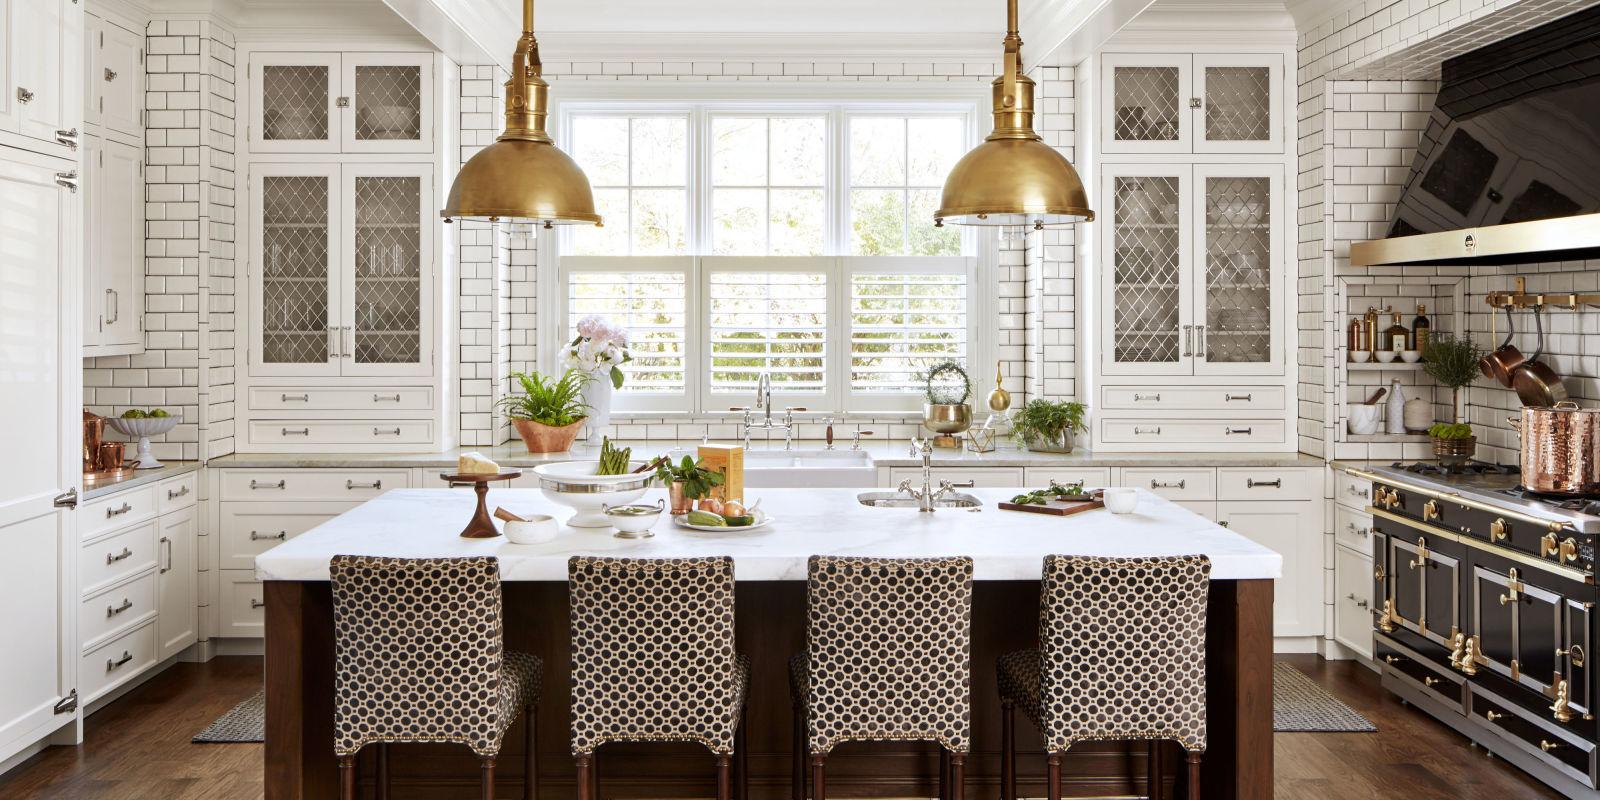 8 Kitchen Tips From Restaurant Pros Rebekah Zaveloff Designs A Professional Kitchen